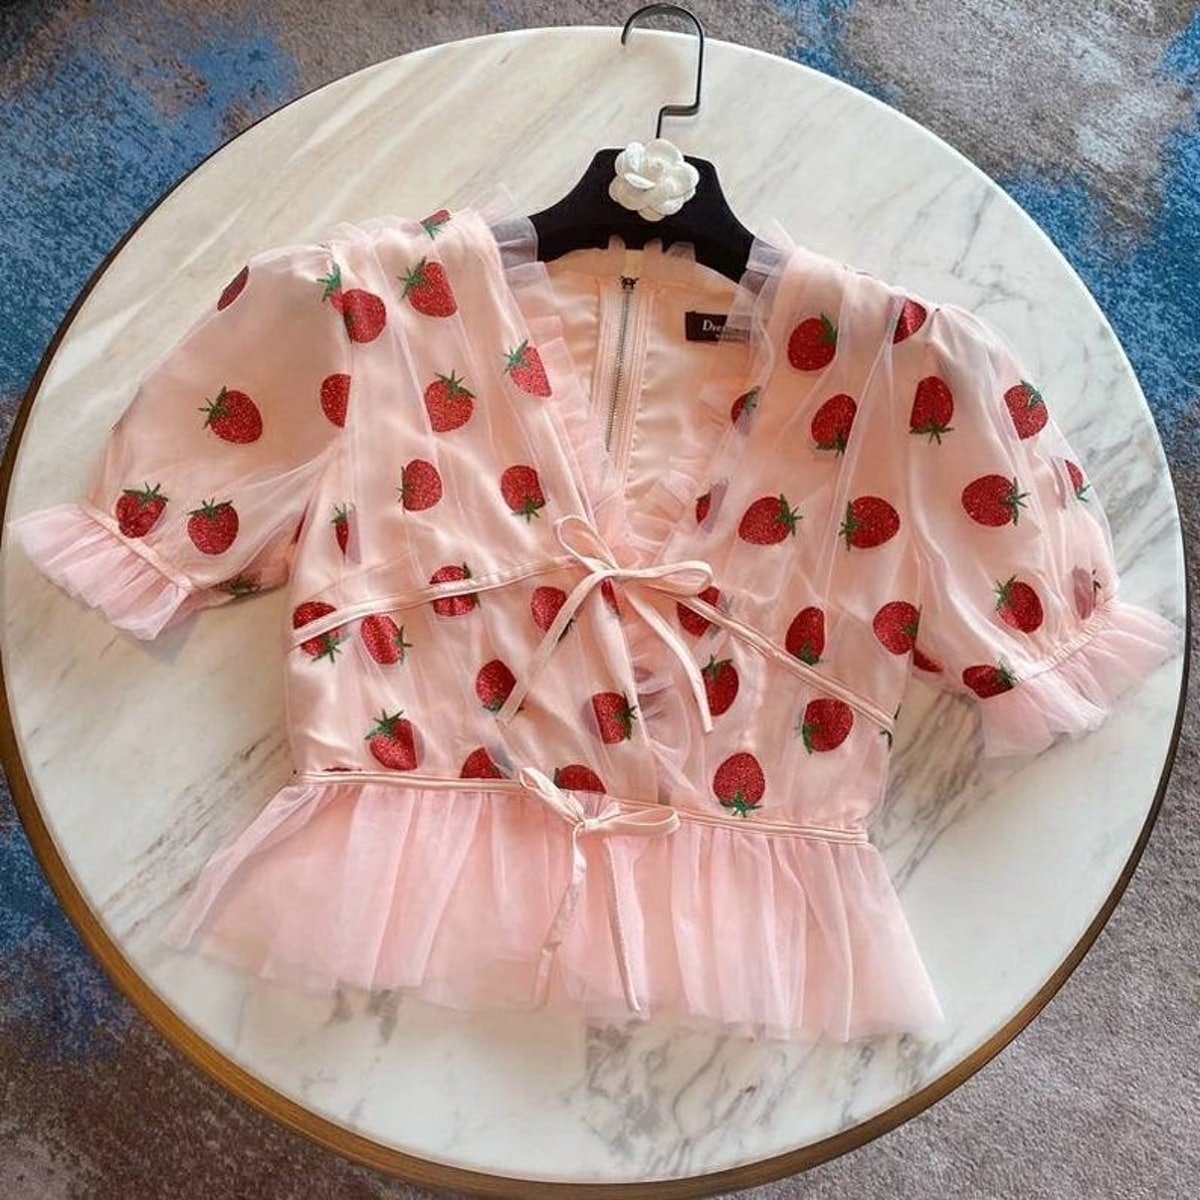 peachmilkbaby Strawberry Top